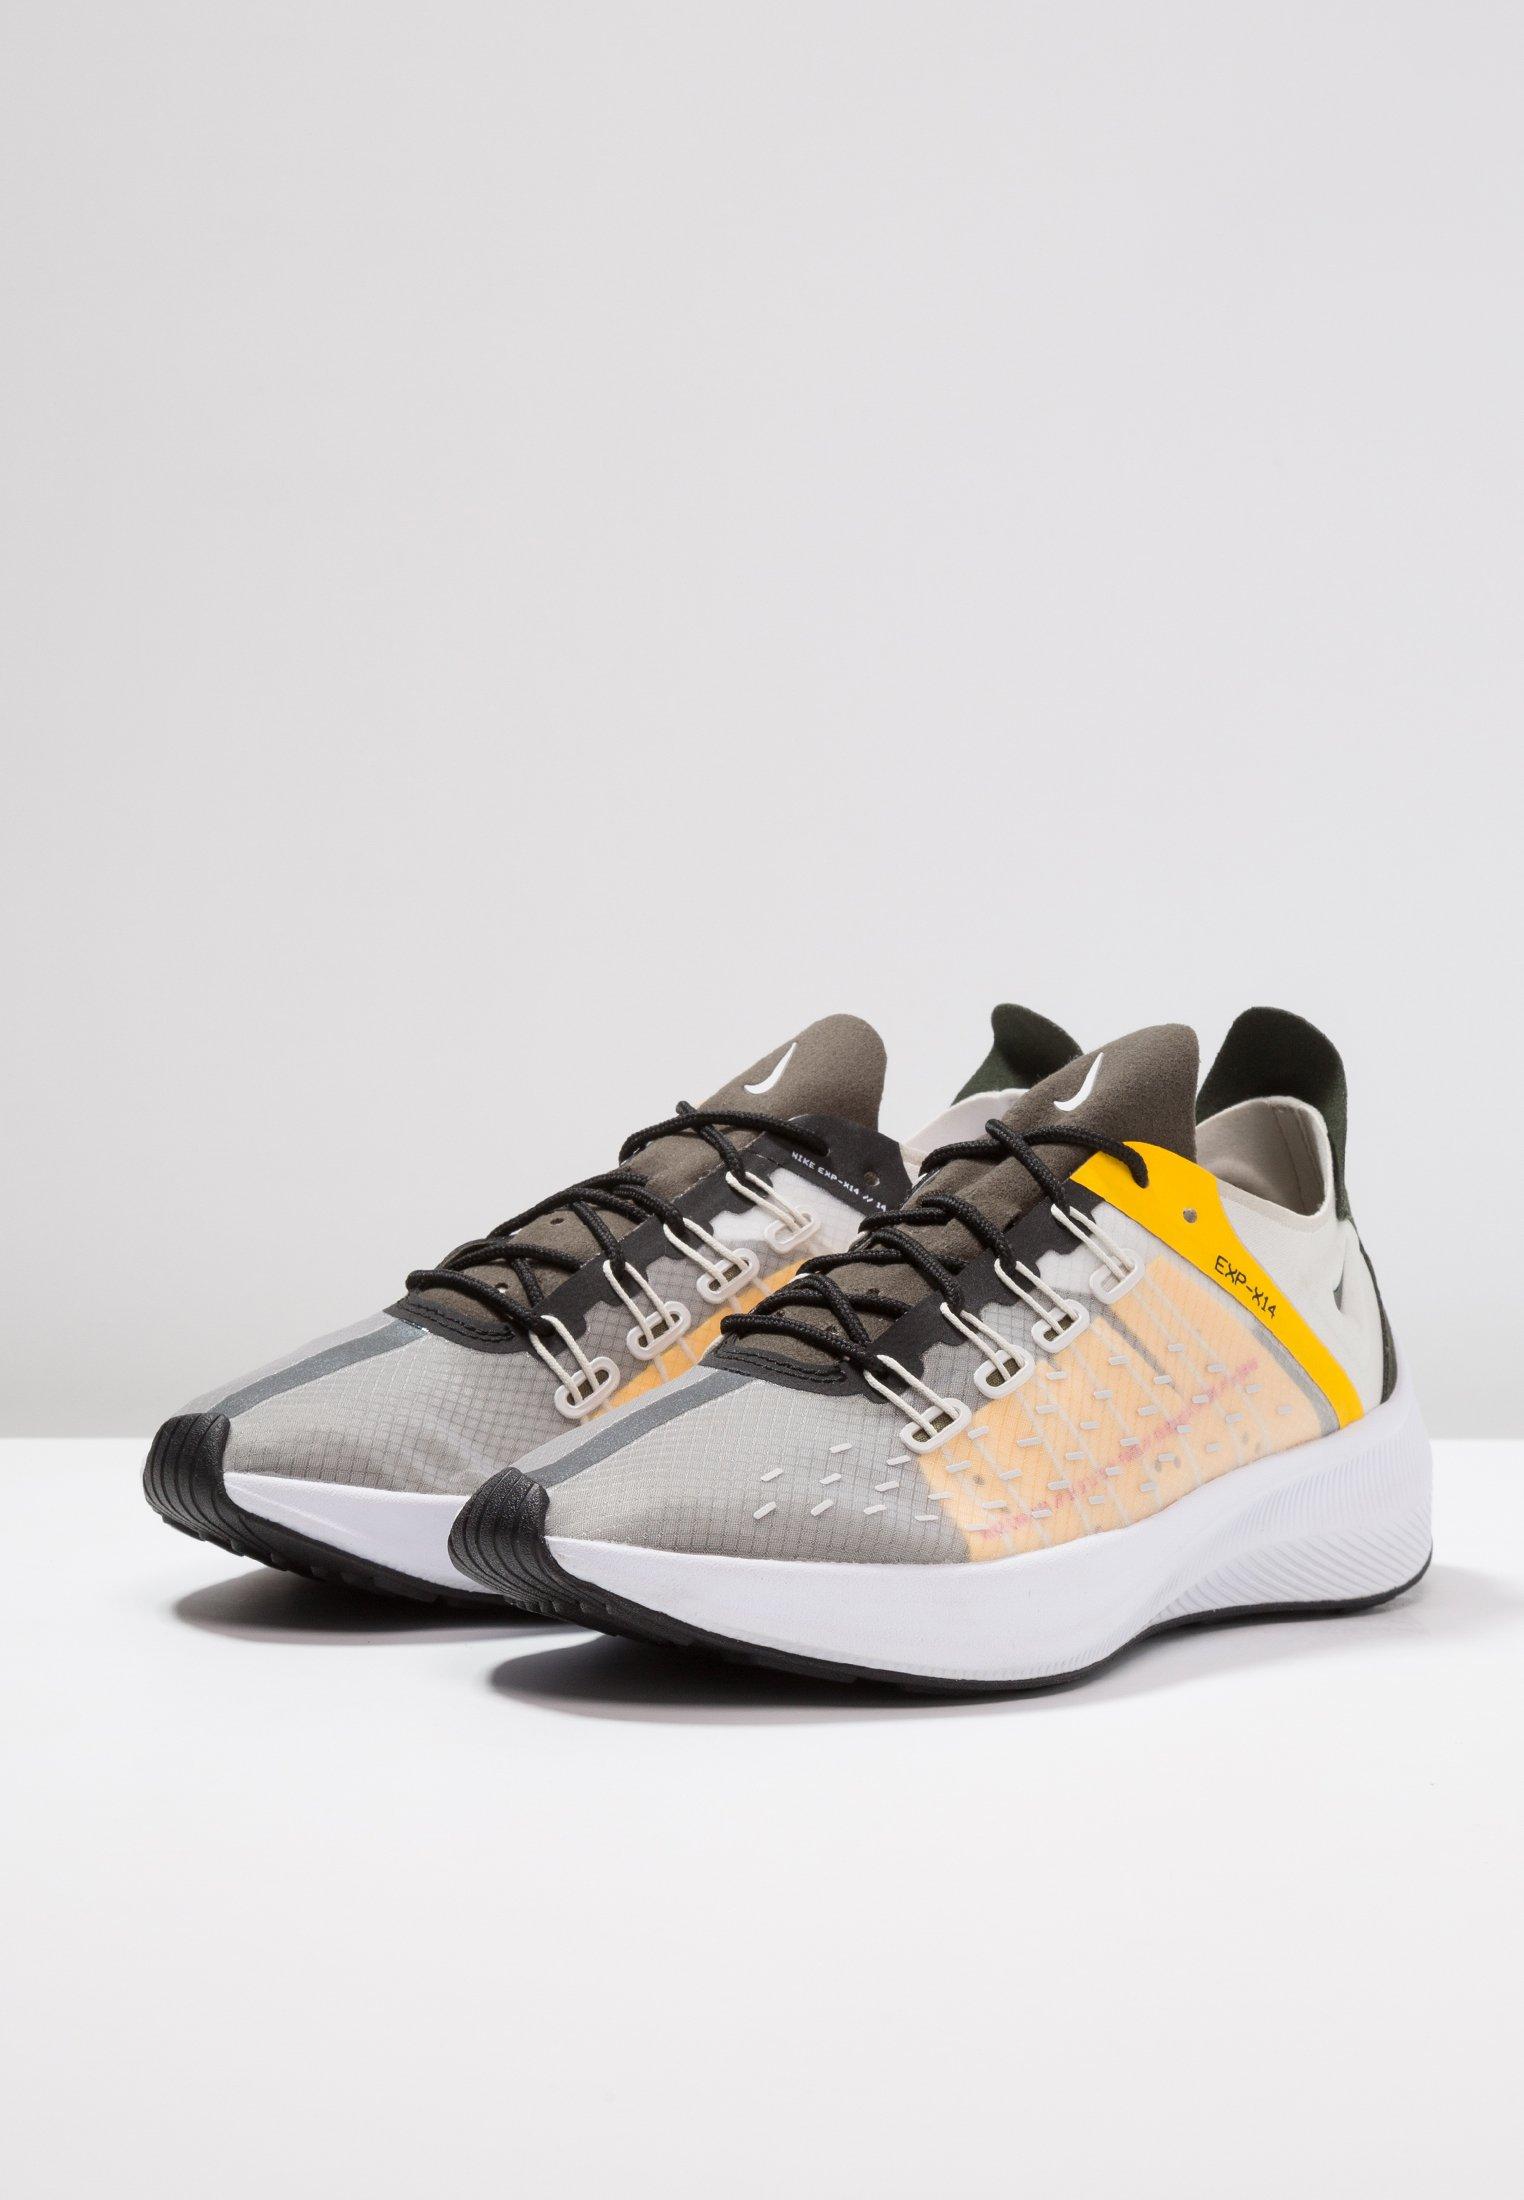 Nike Sportswear EXP-X14 - Baskets basses light bone/bright mango/sequoia/amarillo/medium olive/summit white